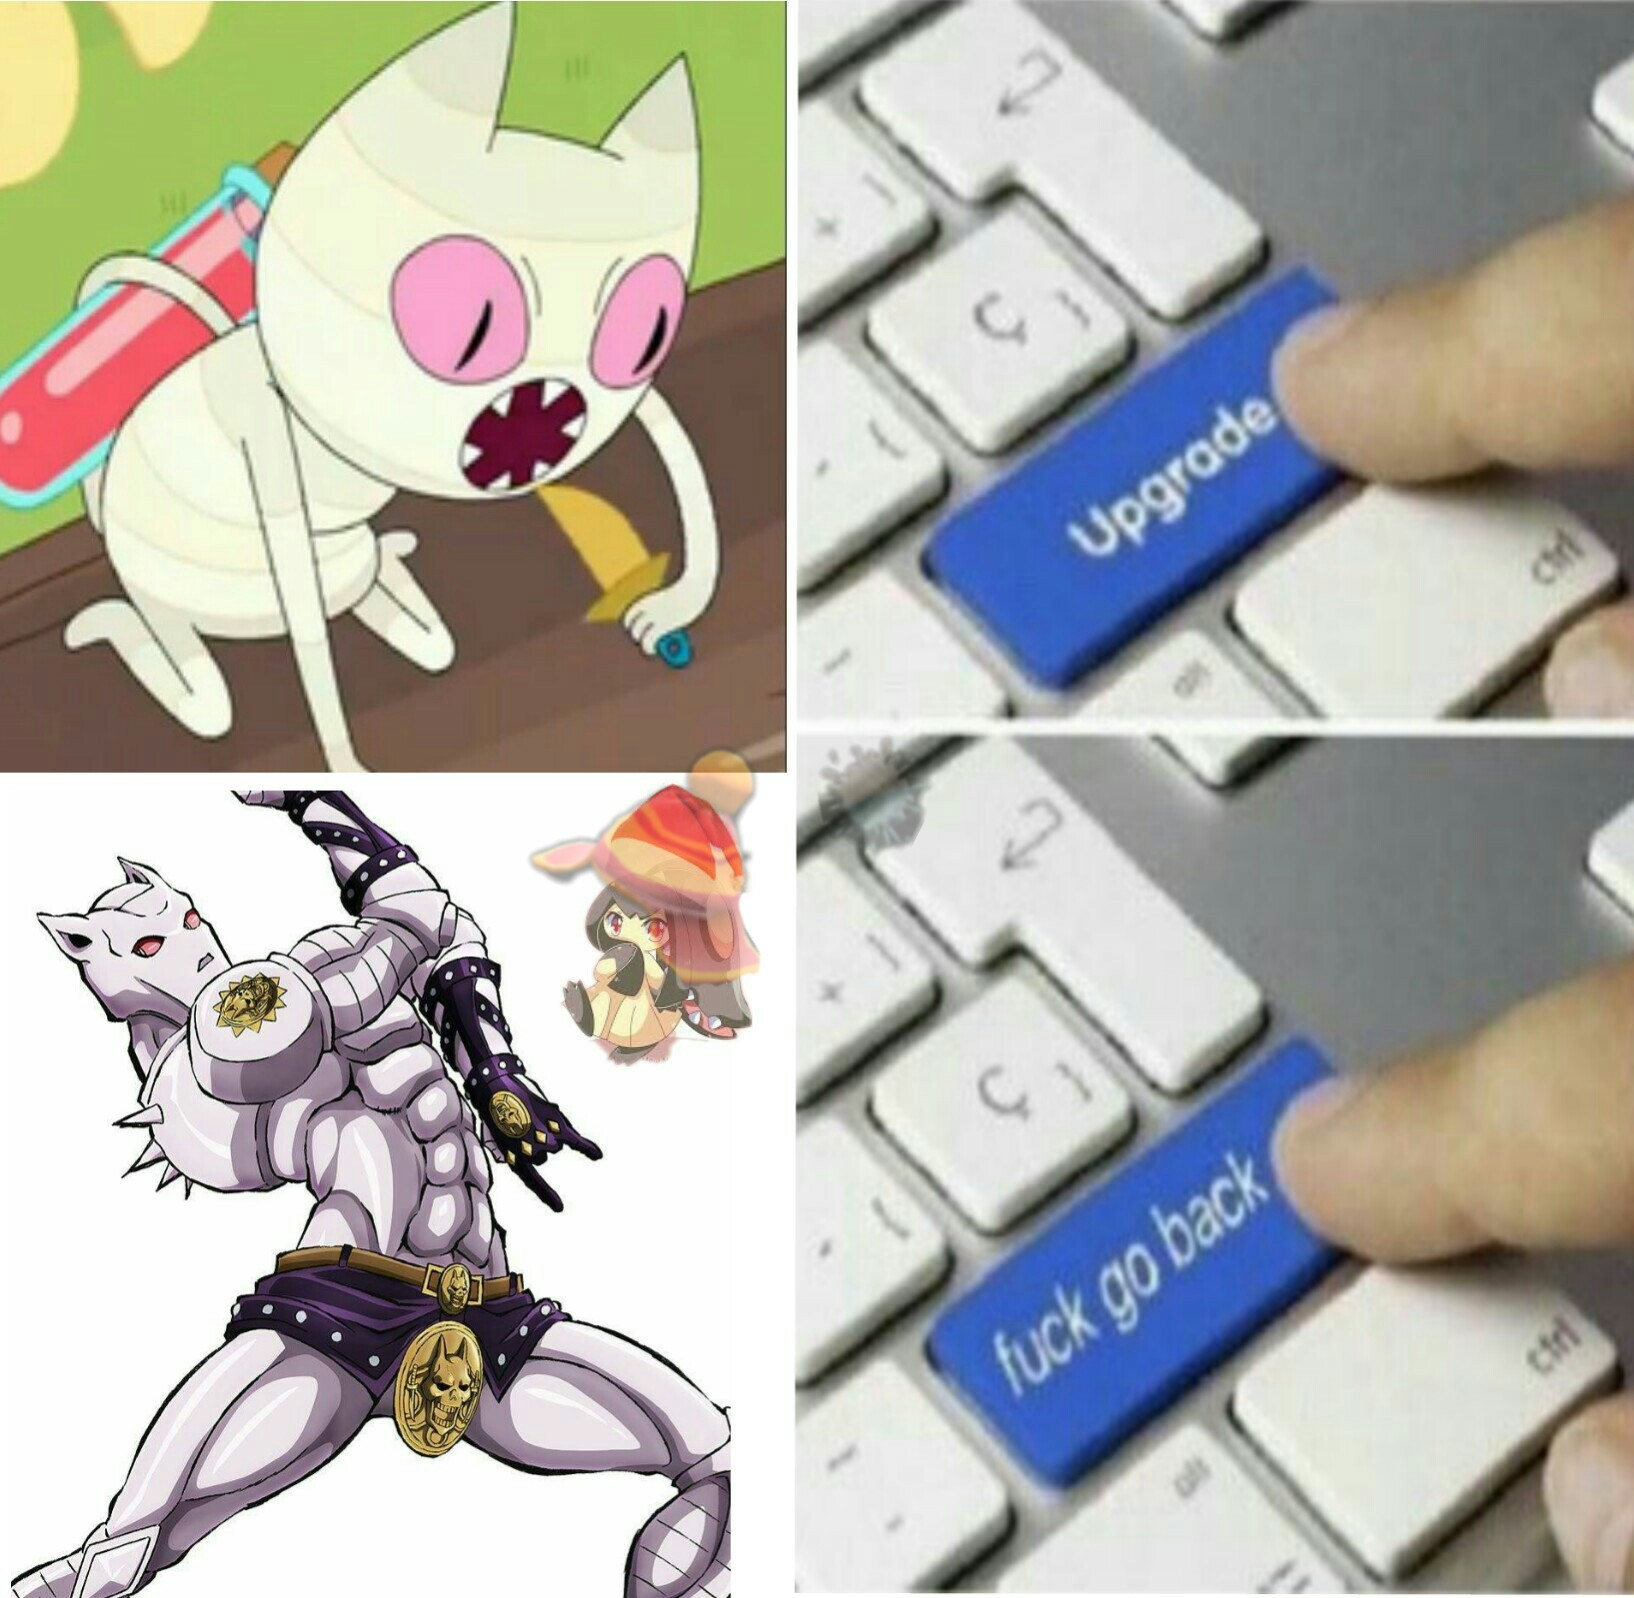 Killer queen, daiso no bakugan. Bites the dust! - meme